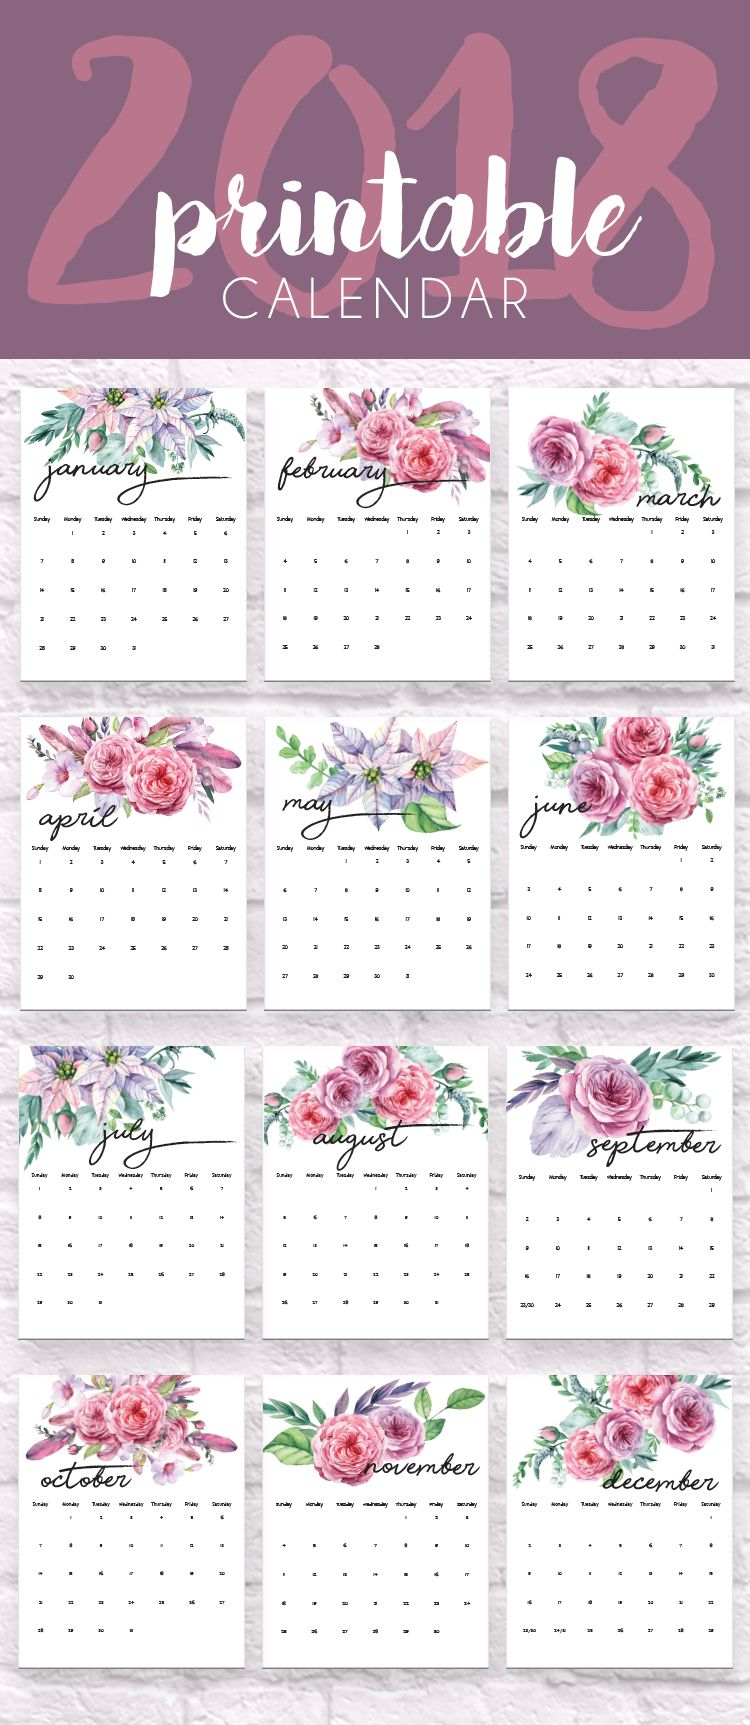 Calendar Organization : Calendars calendar organization and free